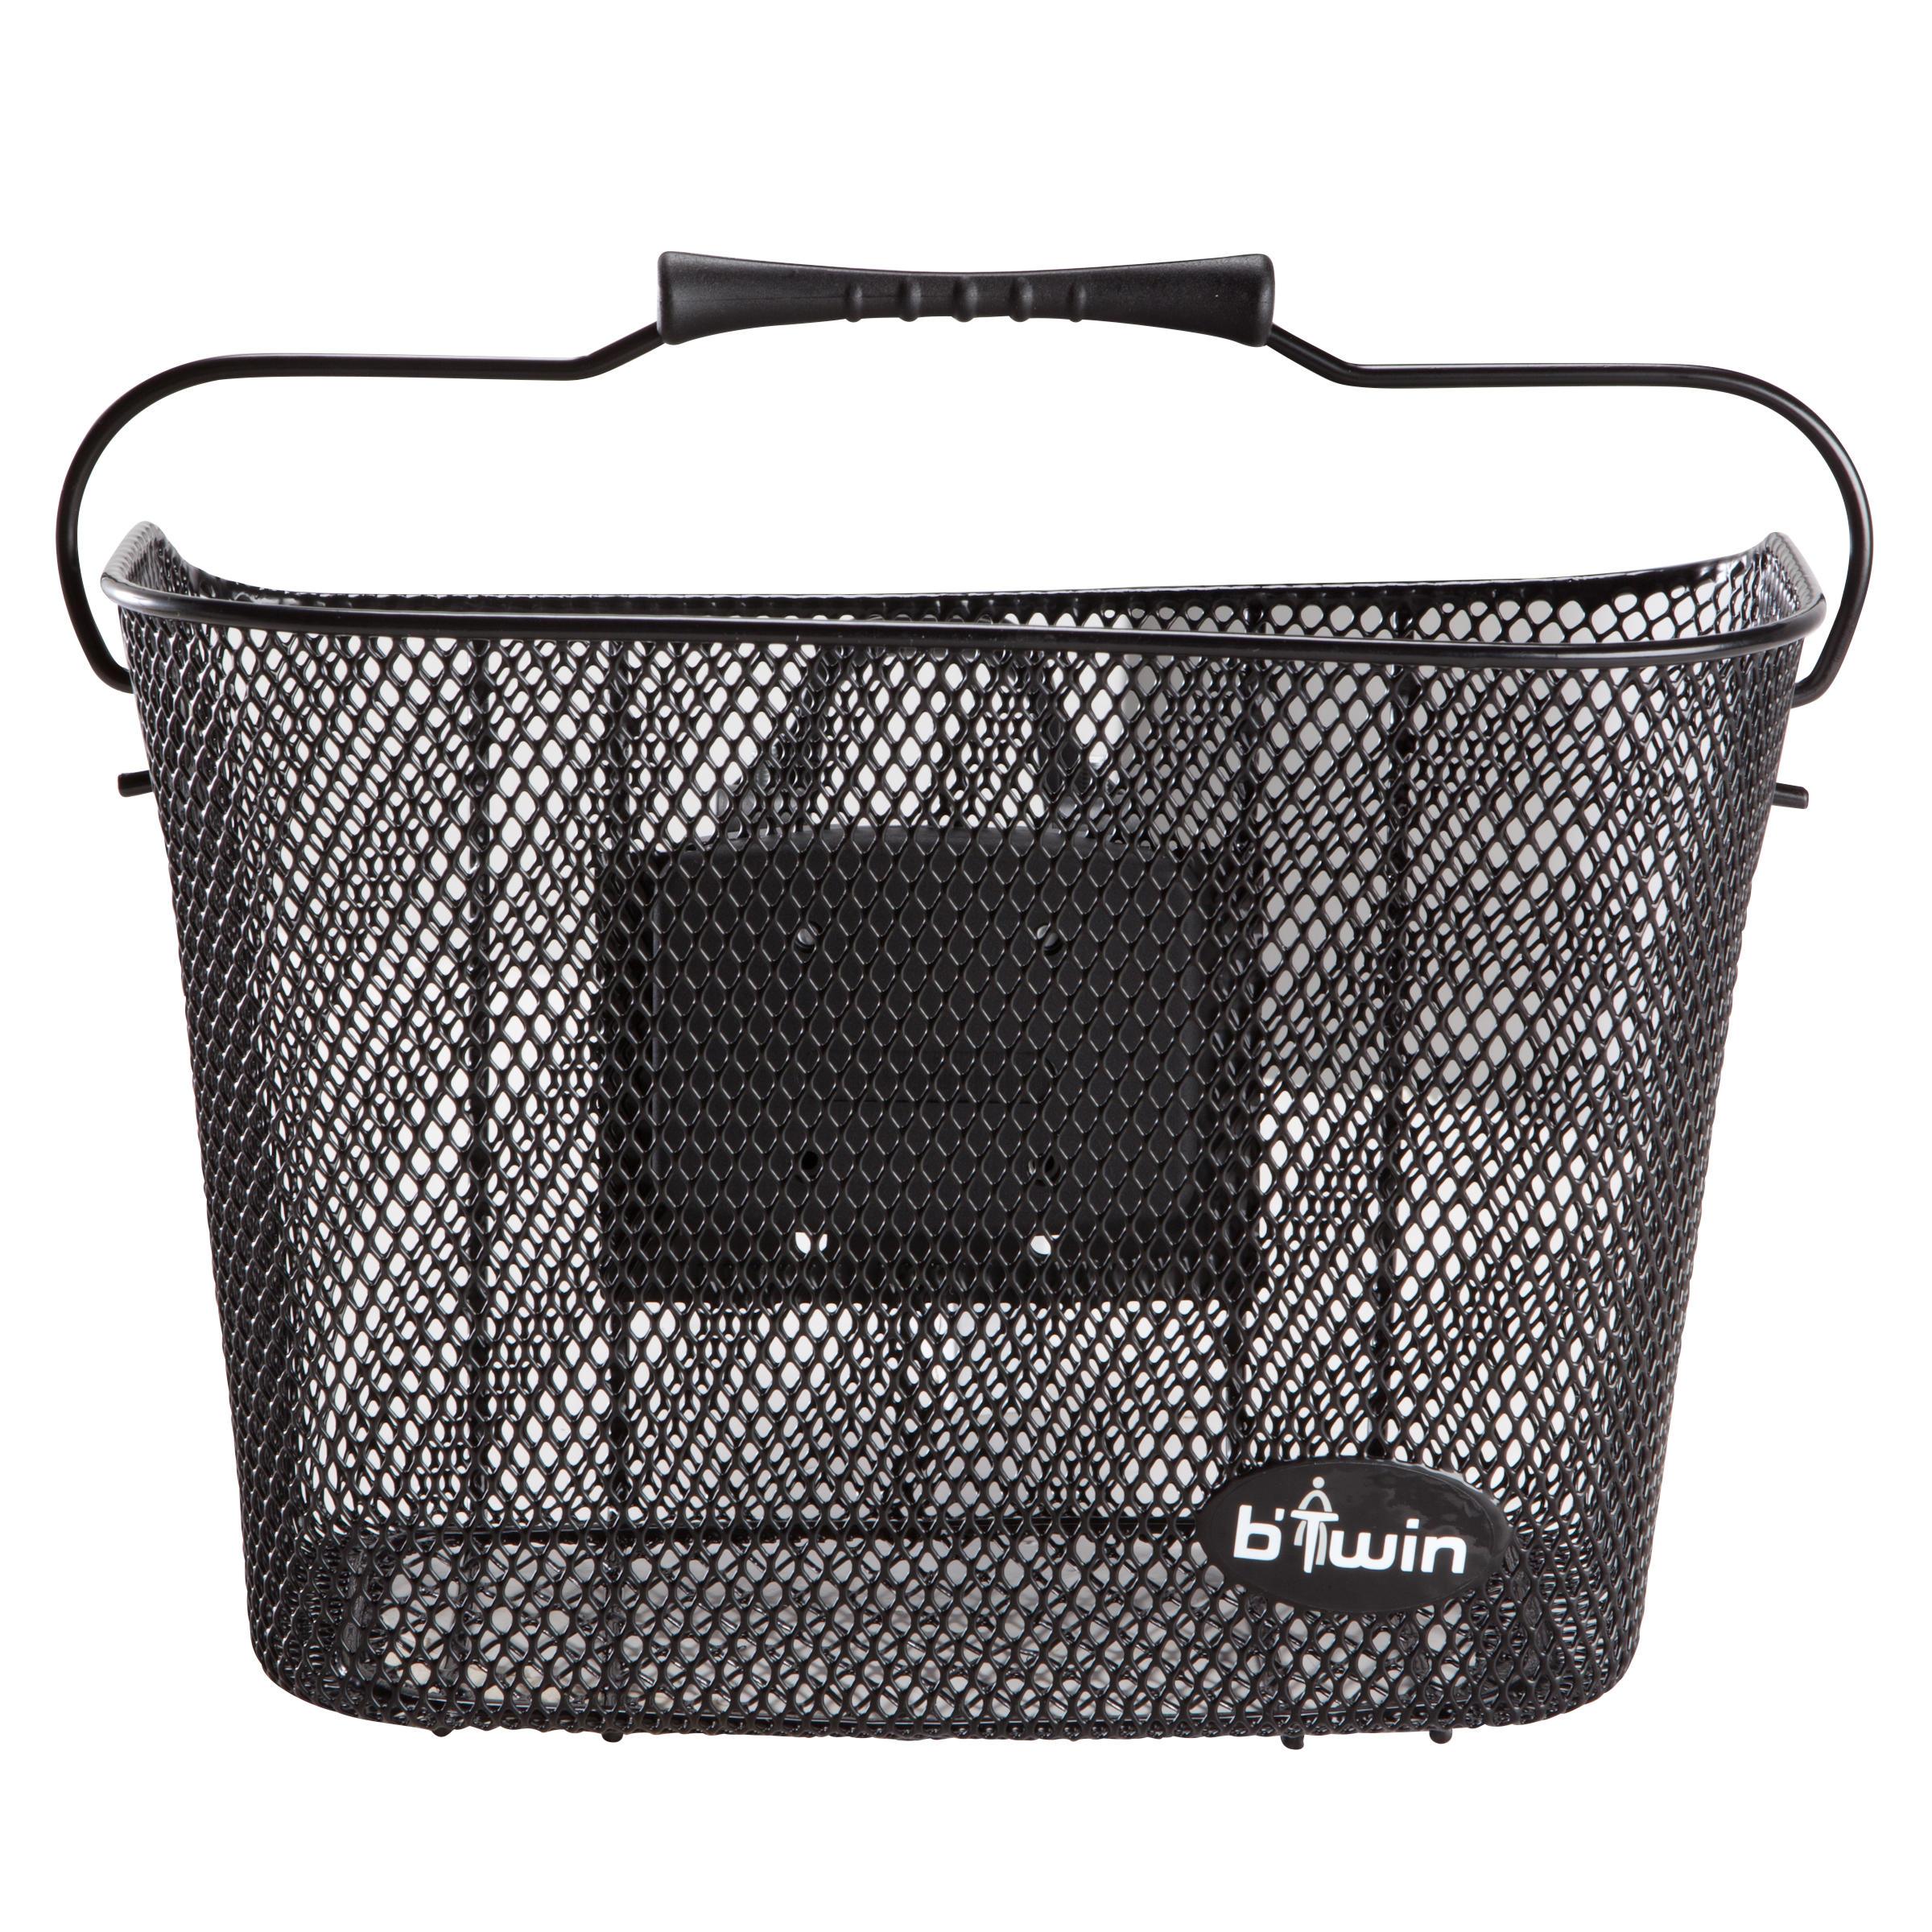 Metal Kids' Bike Basket - Black